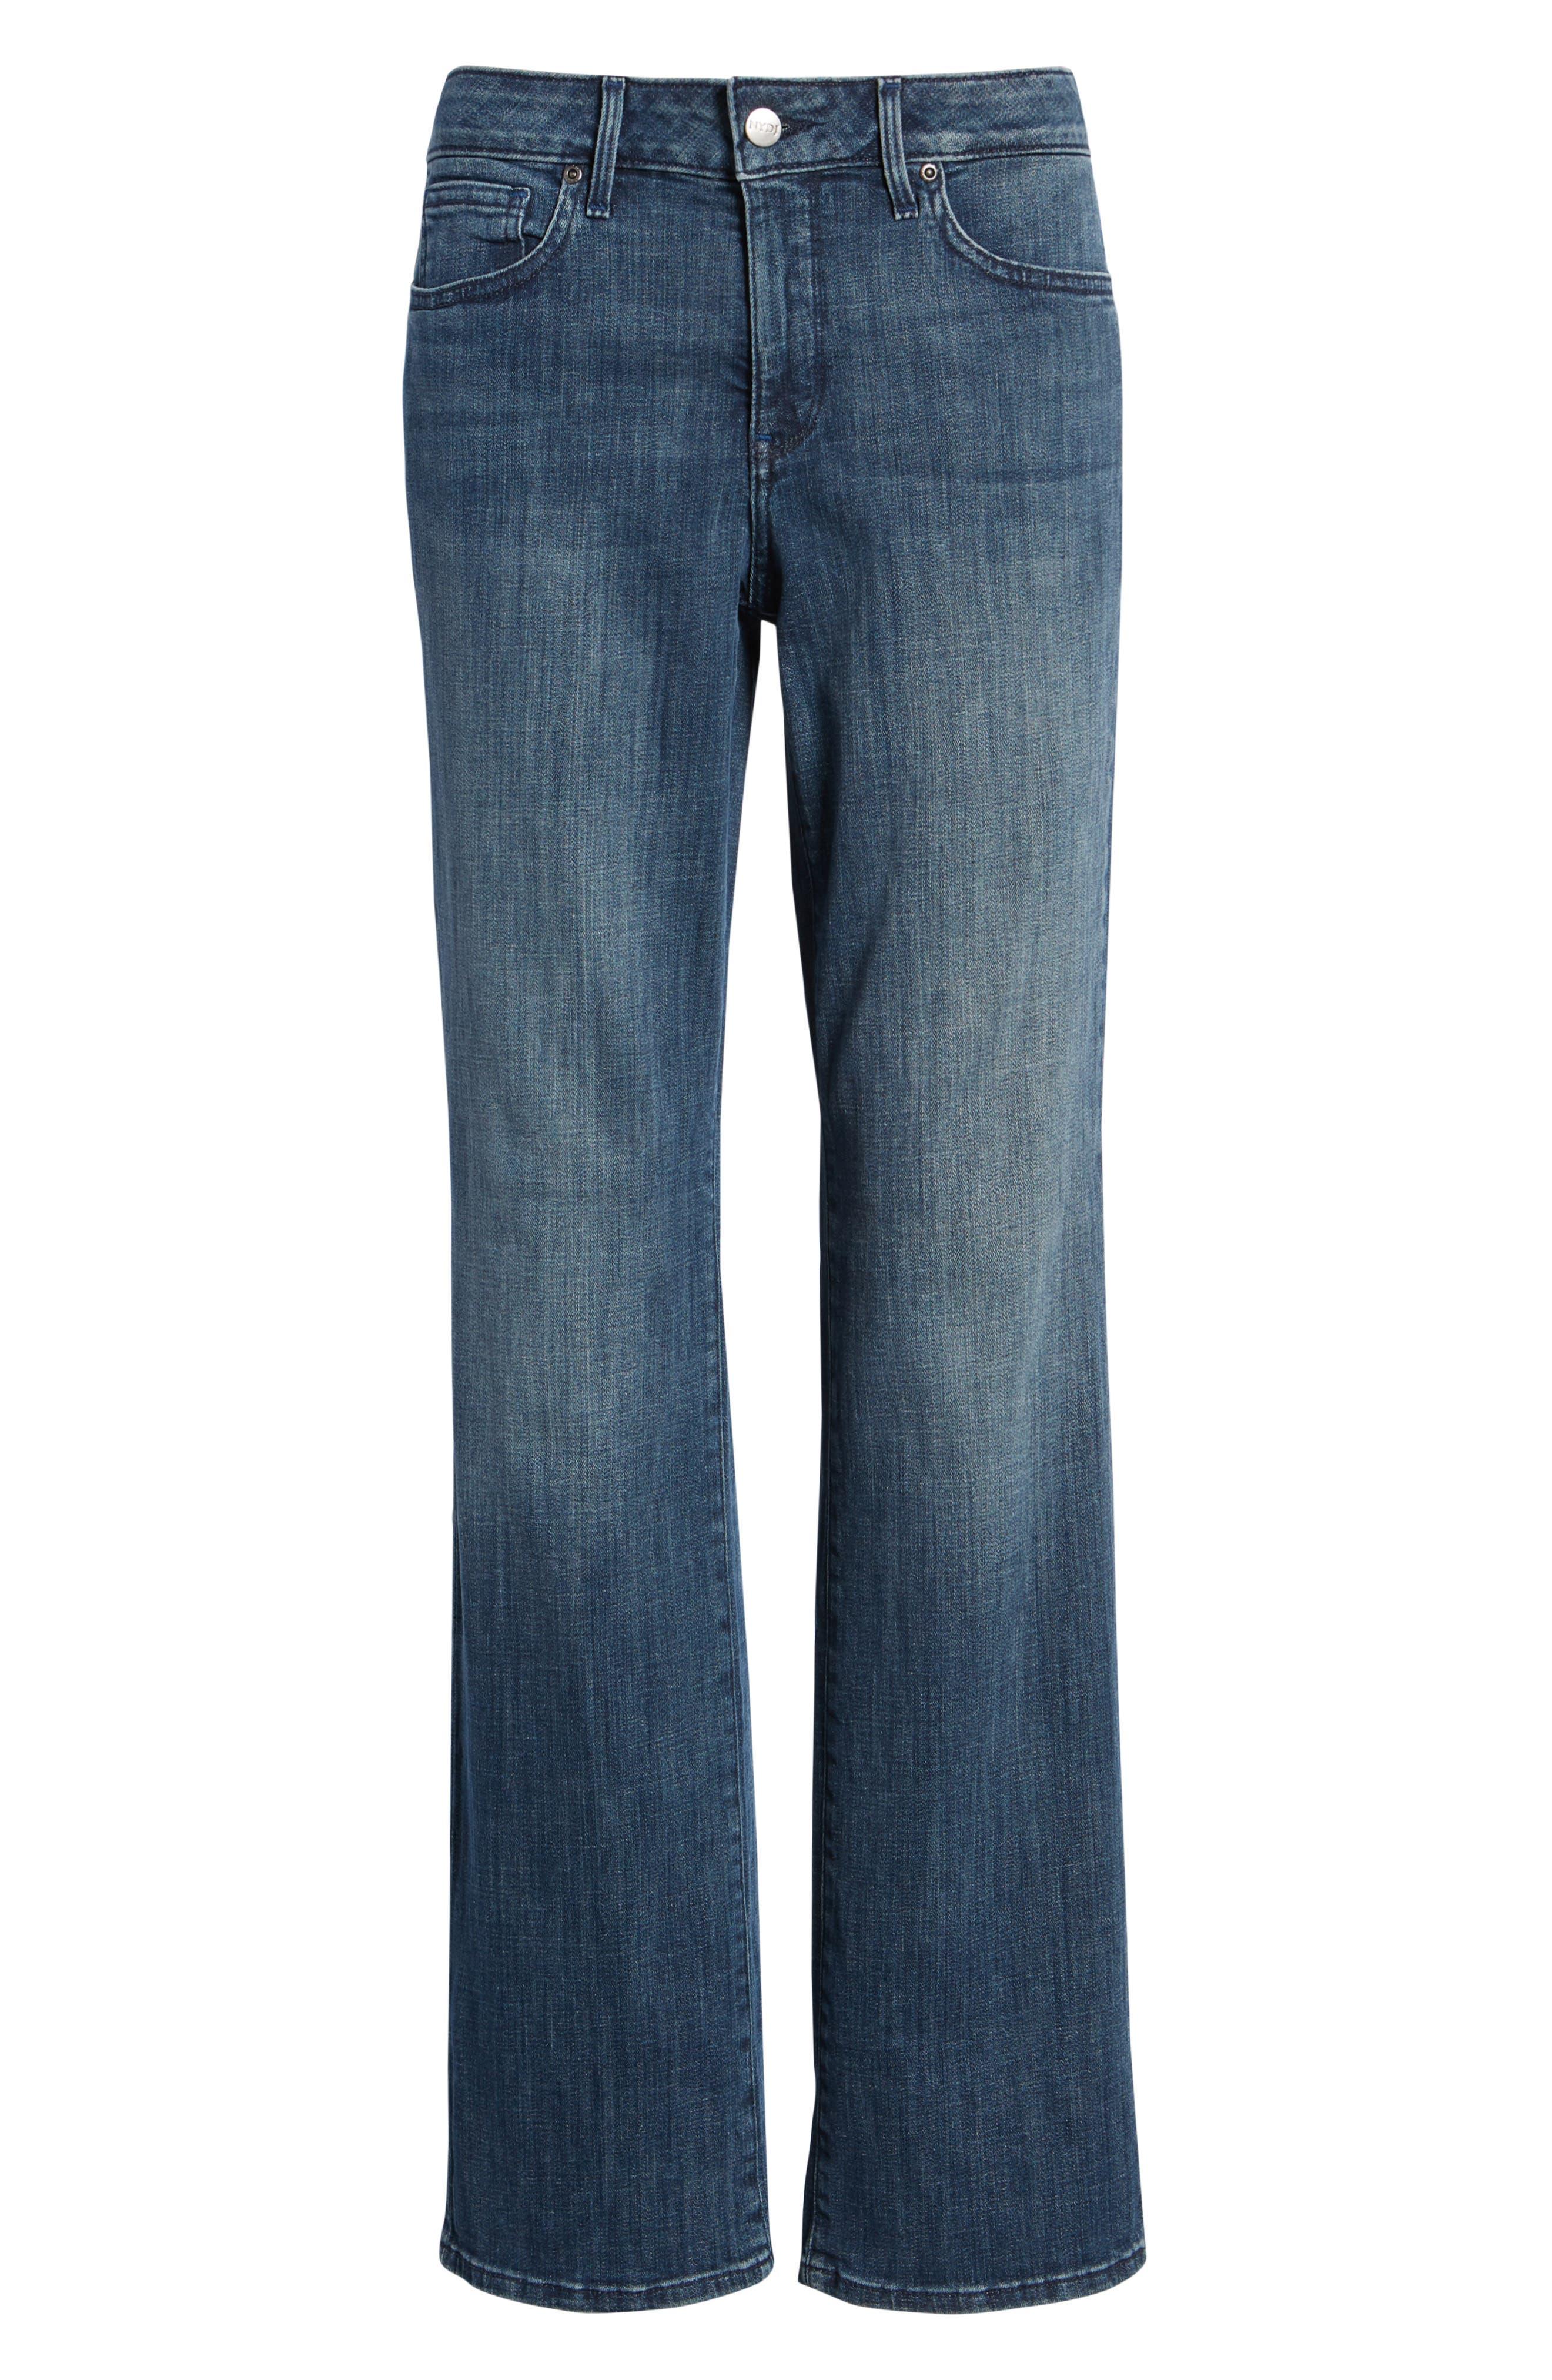 Marilyn Straight Leg Jeans,                             Alternate thumbnail 4, color,                             LUPINE